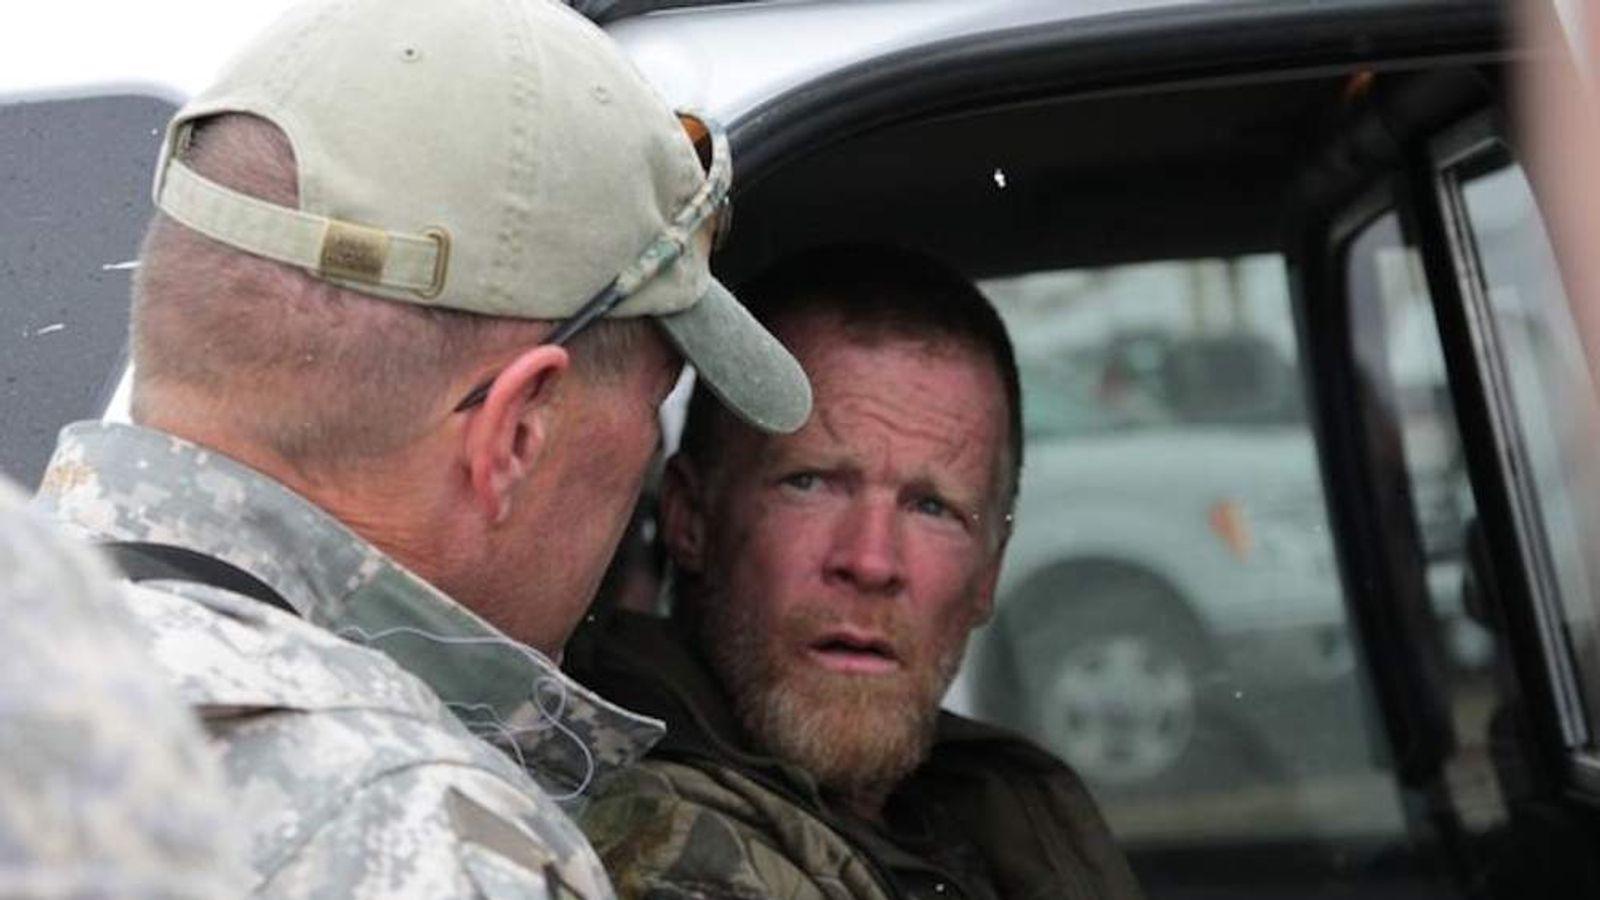 Troy Knapp, Mountain Man survivalist, sentenced to 10